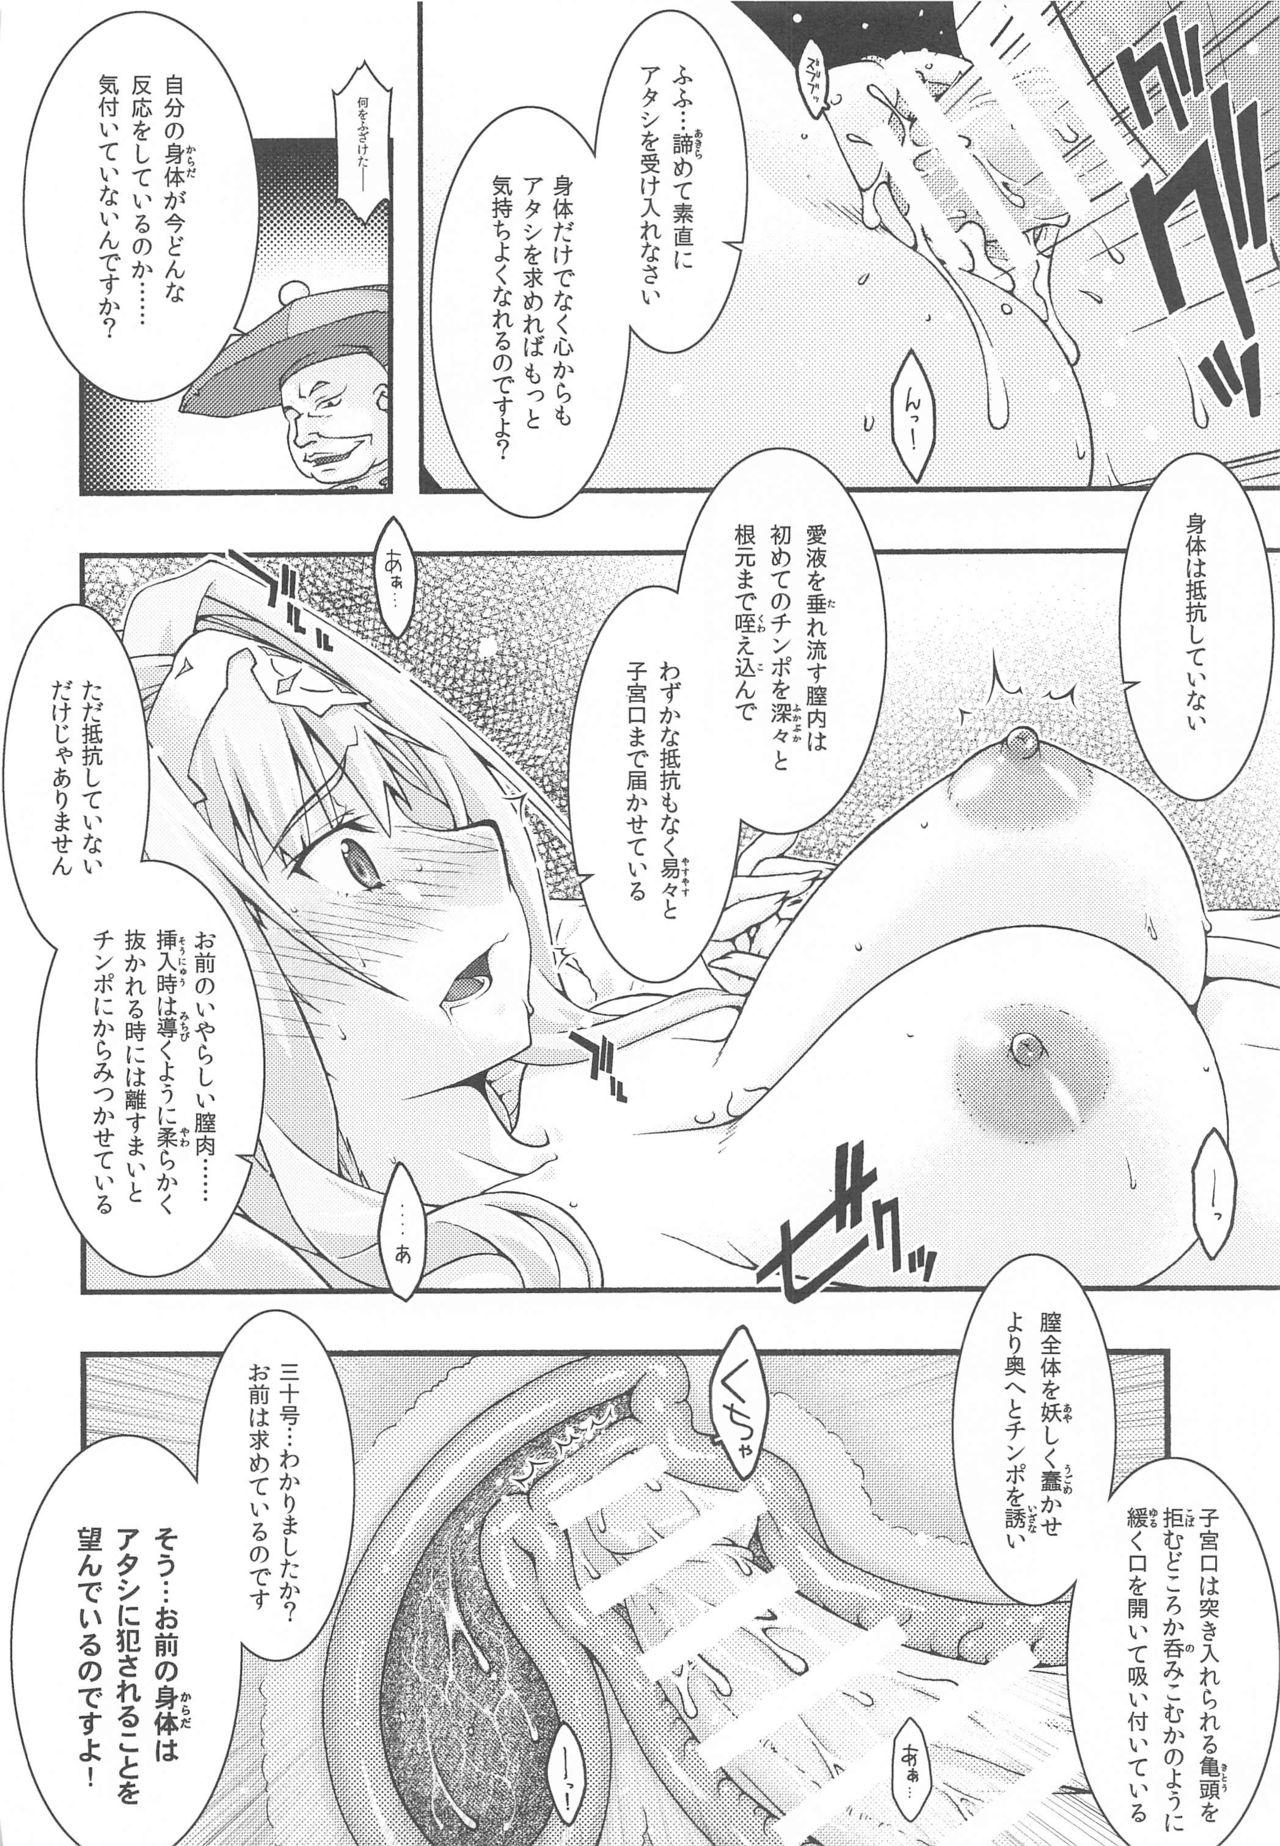 Ochiru 24